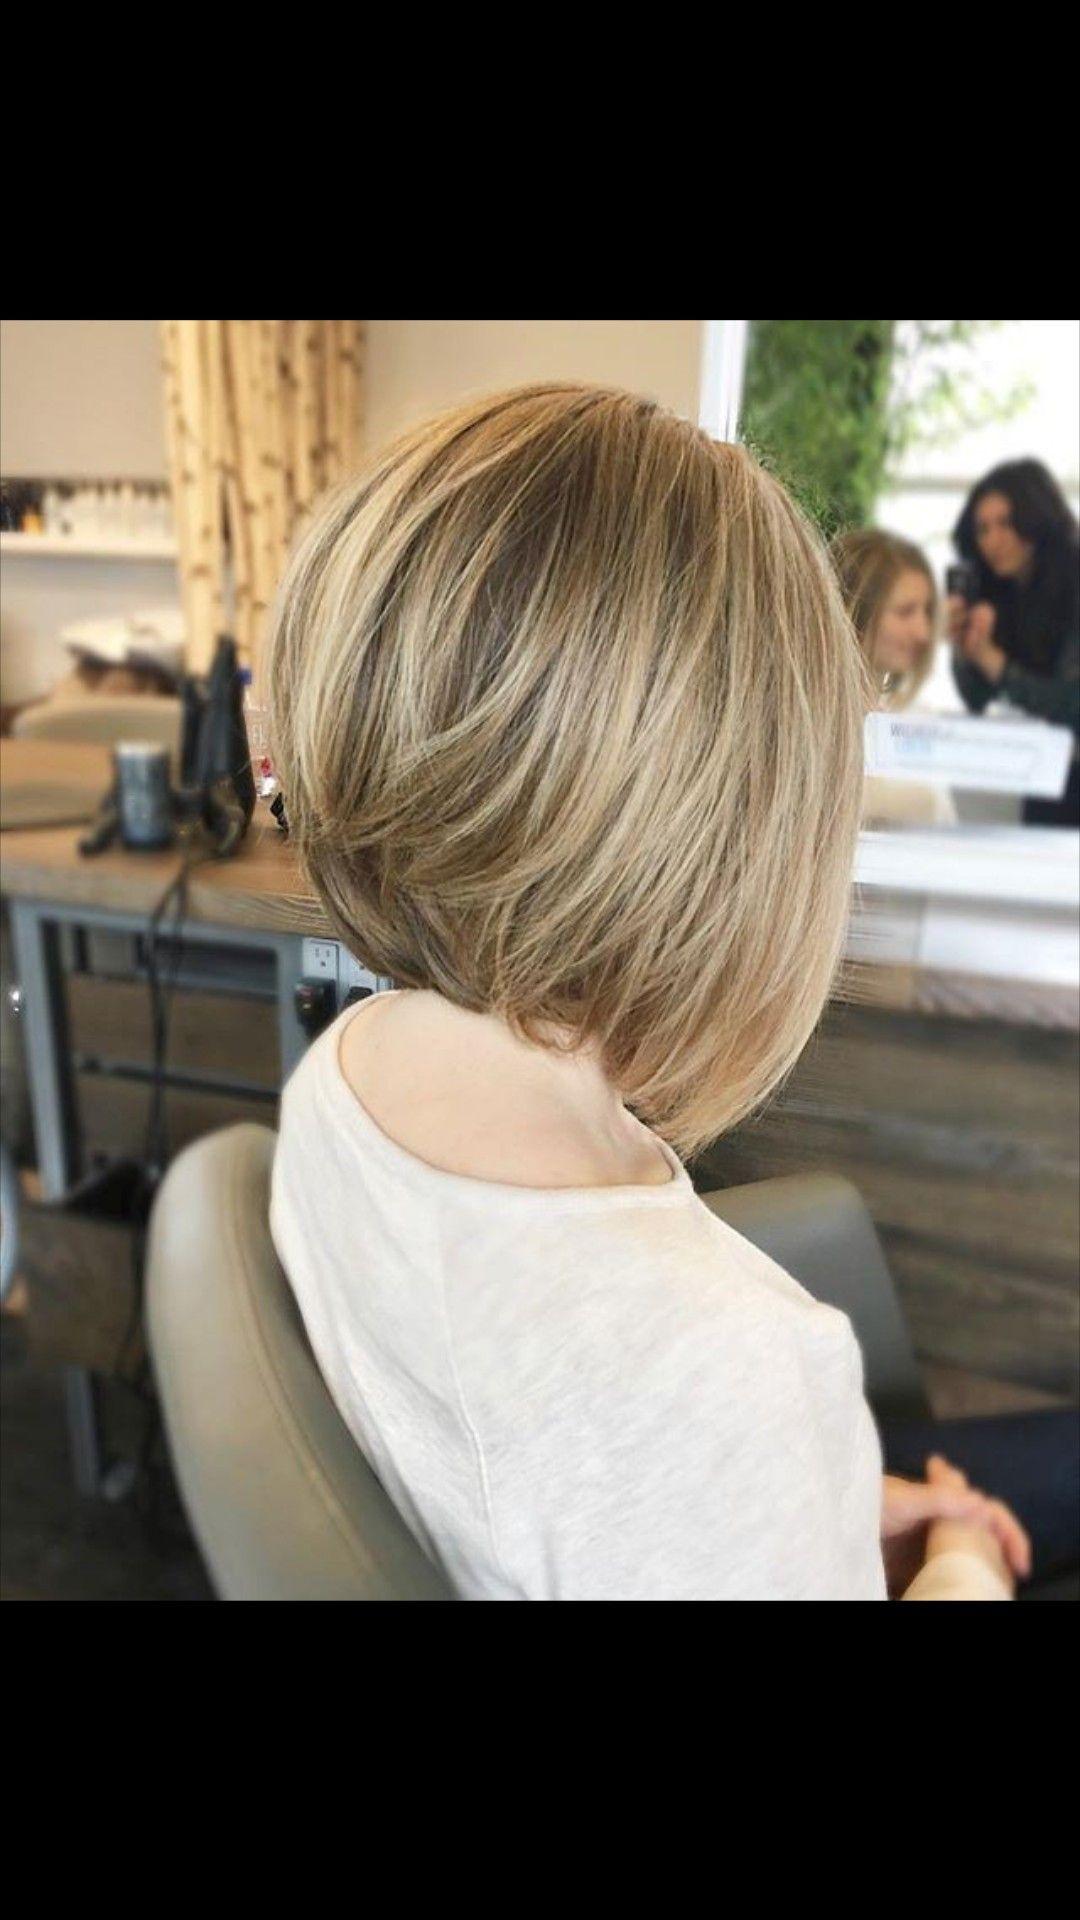 Pin By Amanda Klein Connell On Hair Pinterest Hair Hair Styles